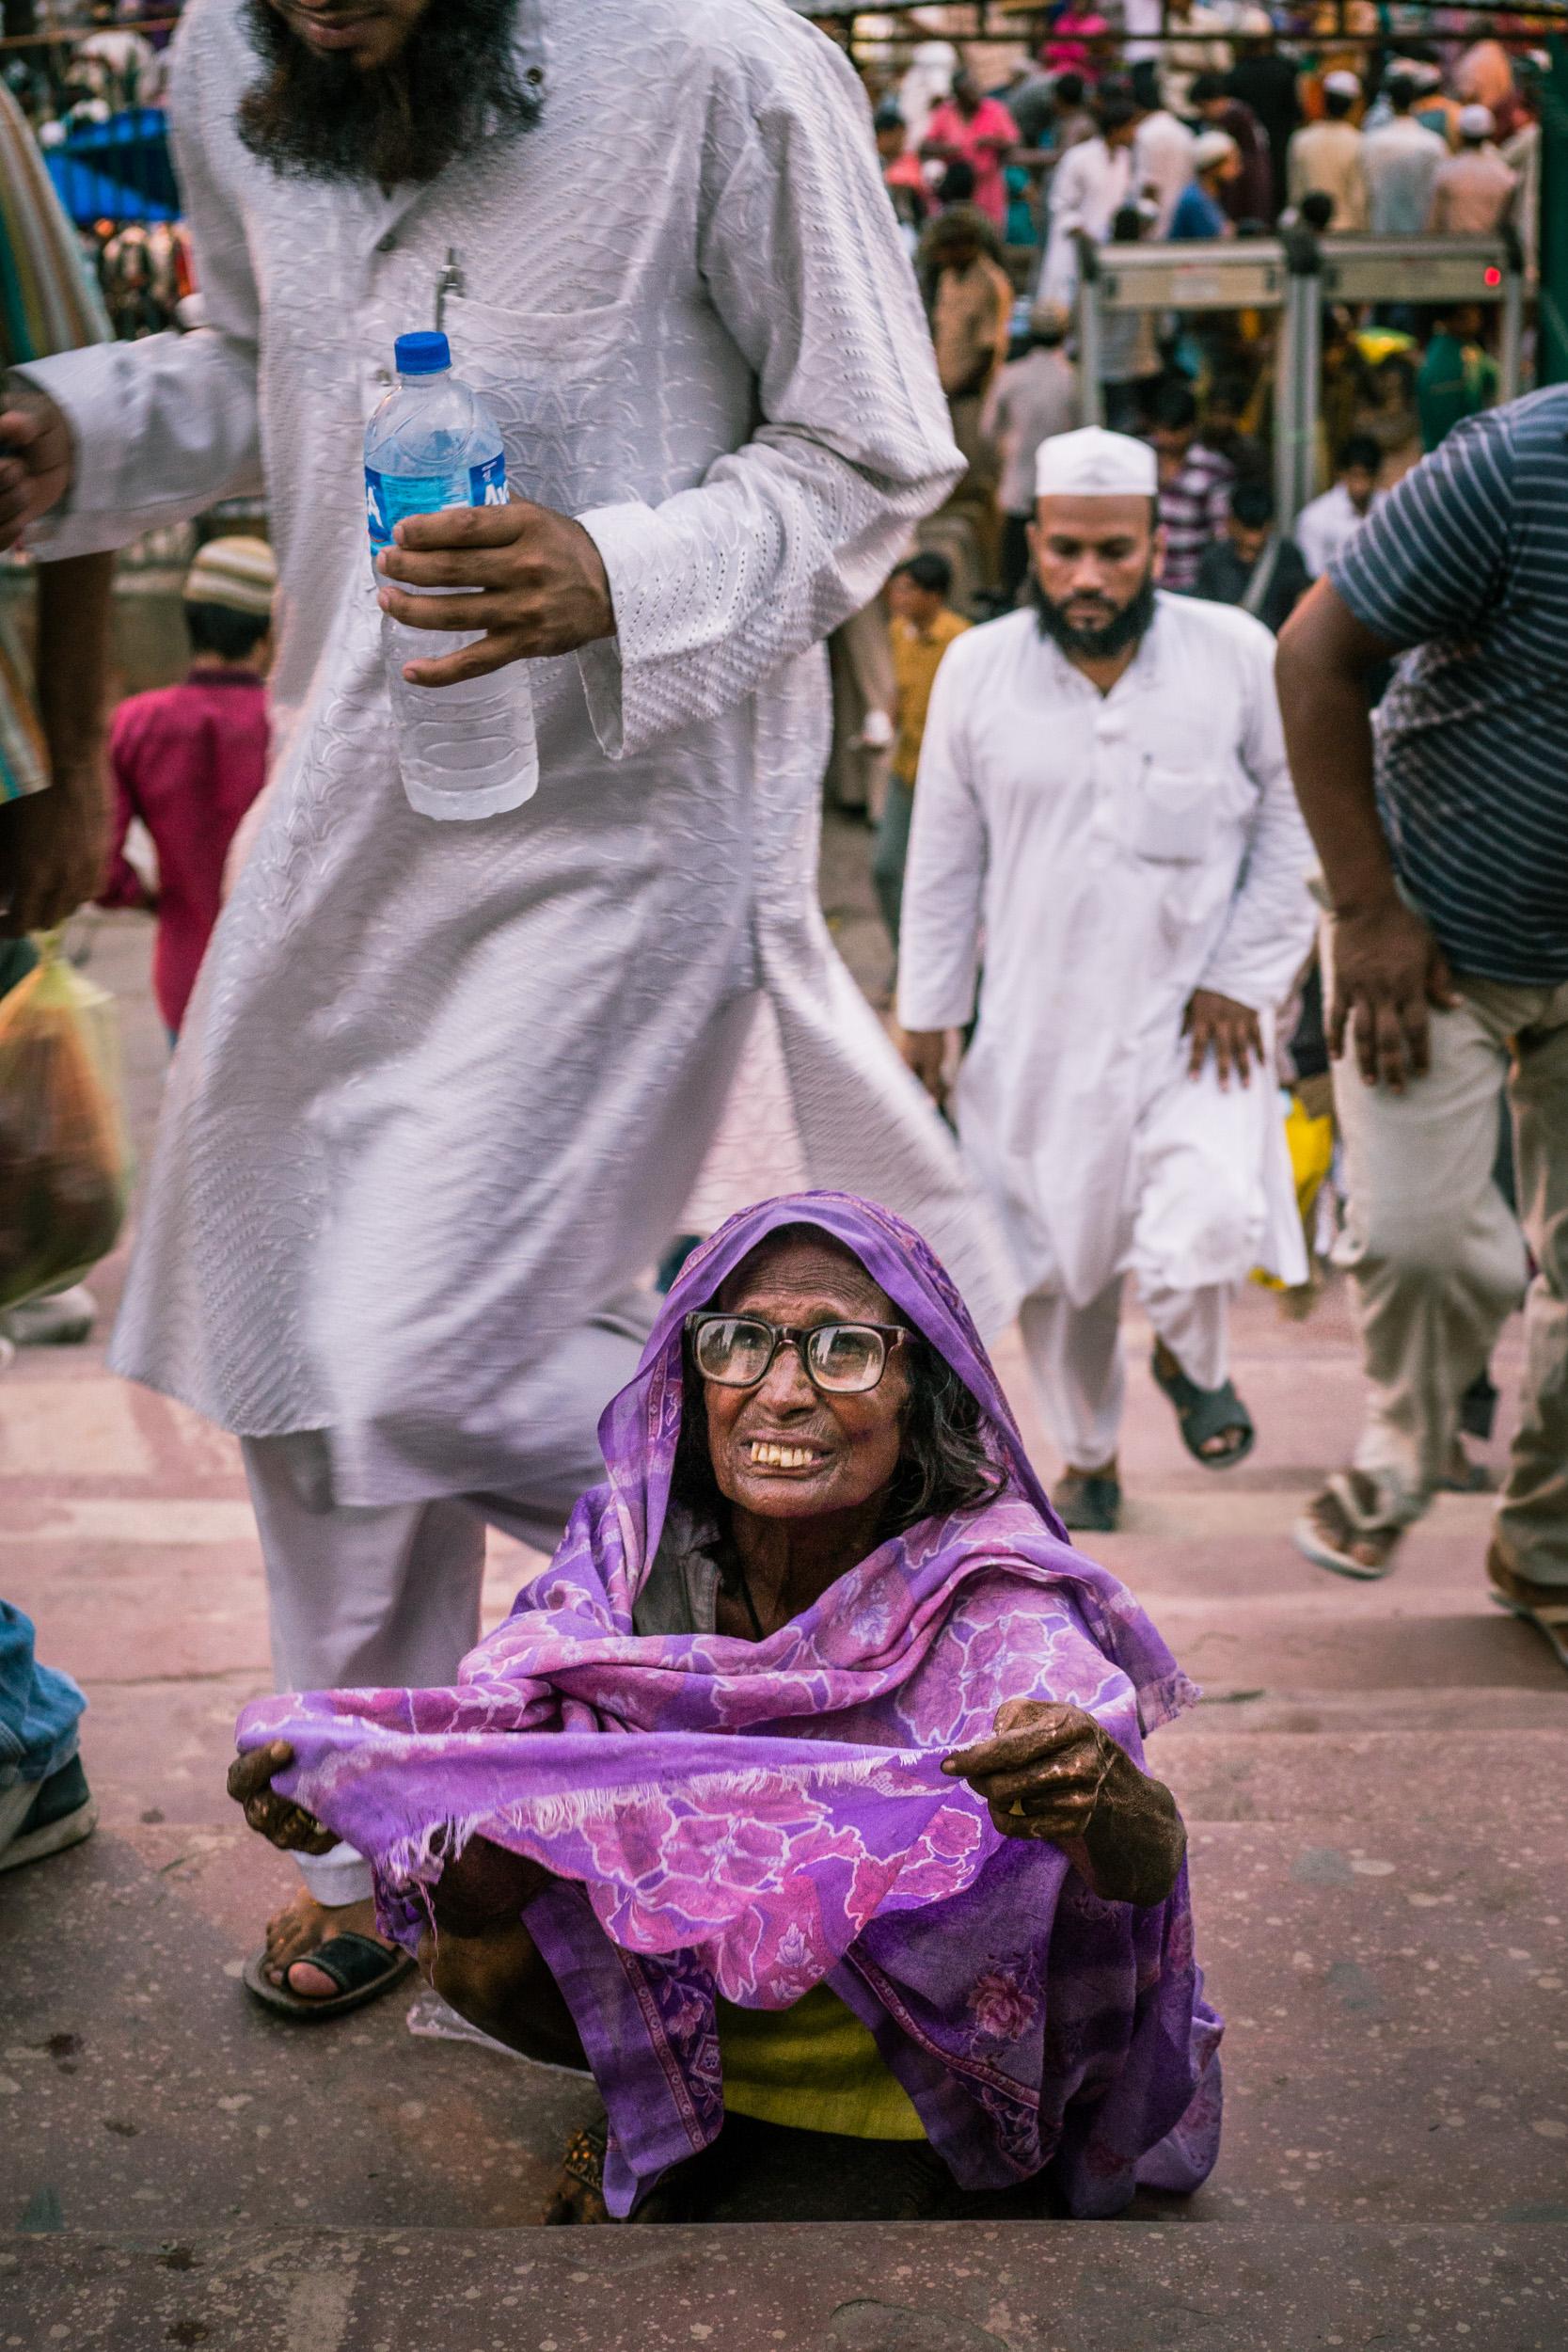 _25 Old Woman beggar Delhi India.jpg